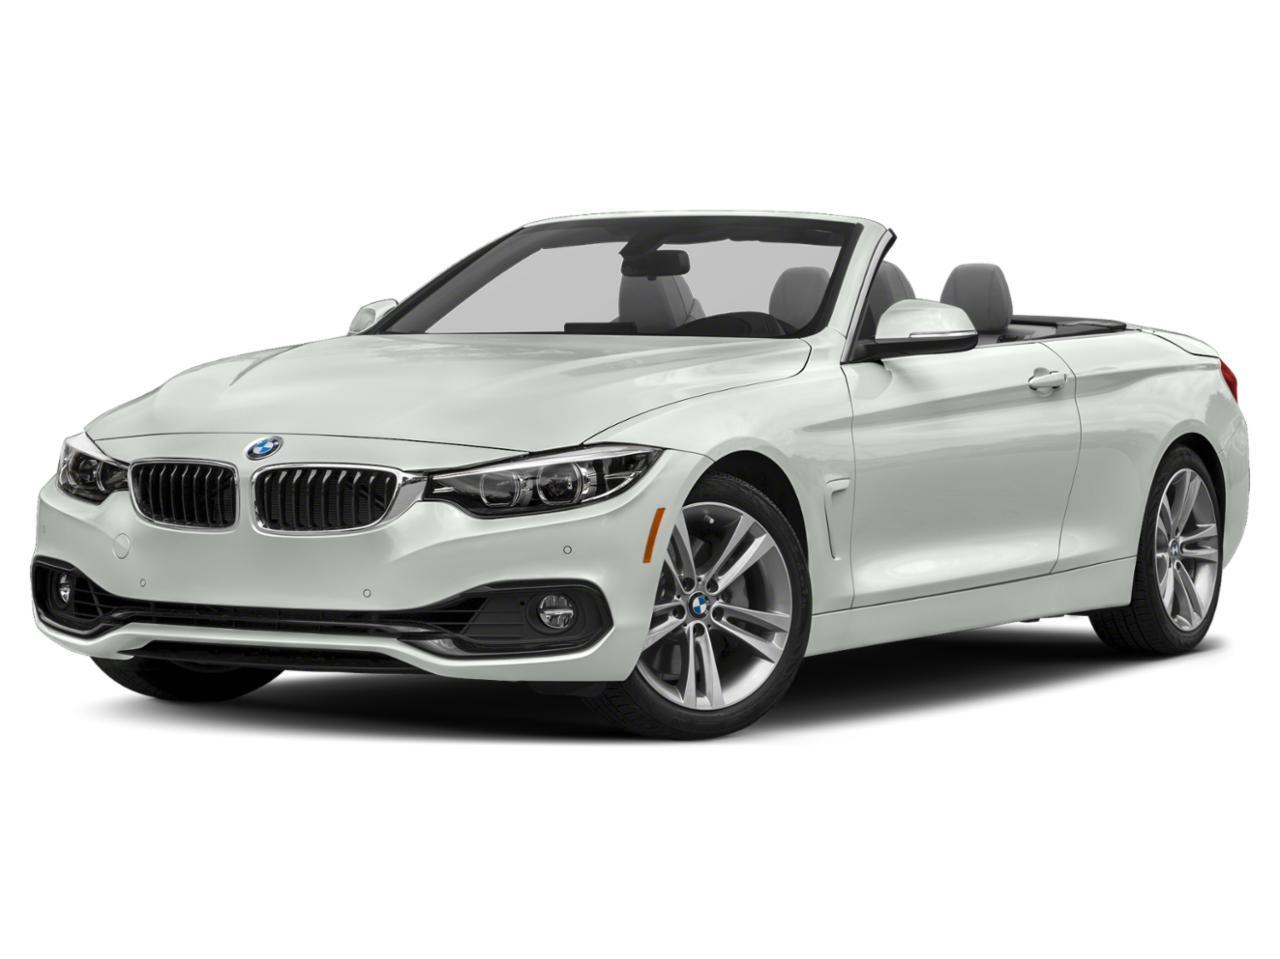 2020 BMW 440i Vehicle Photo in Grapevine, TX 76051